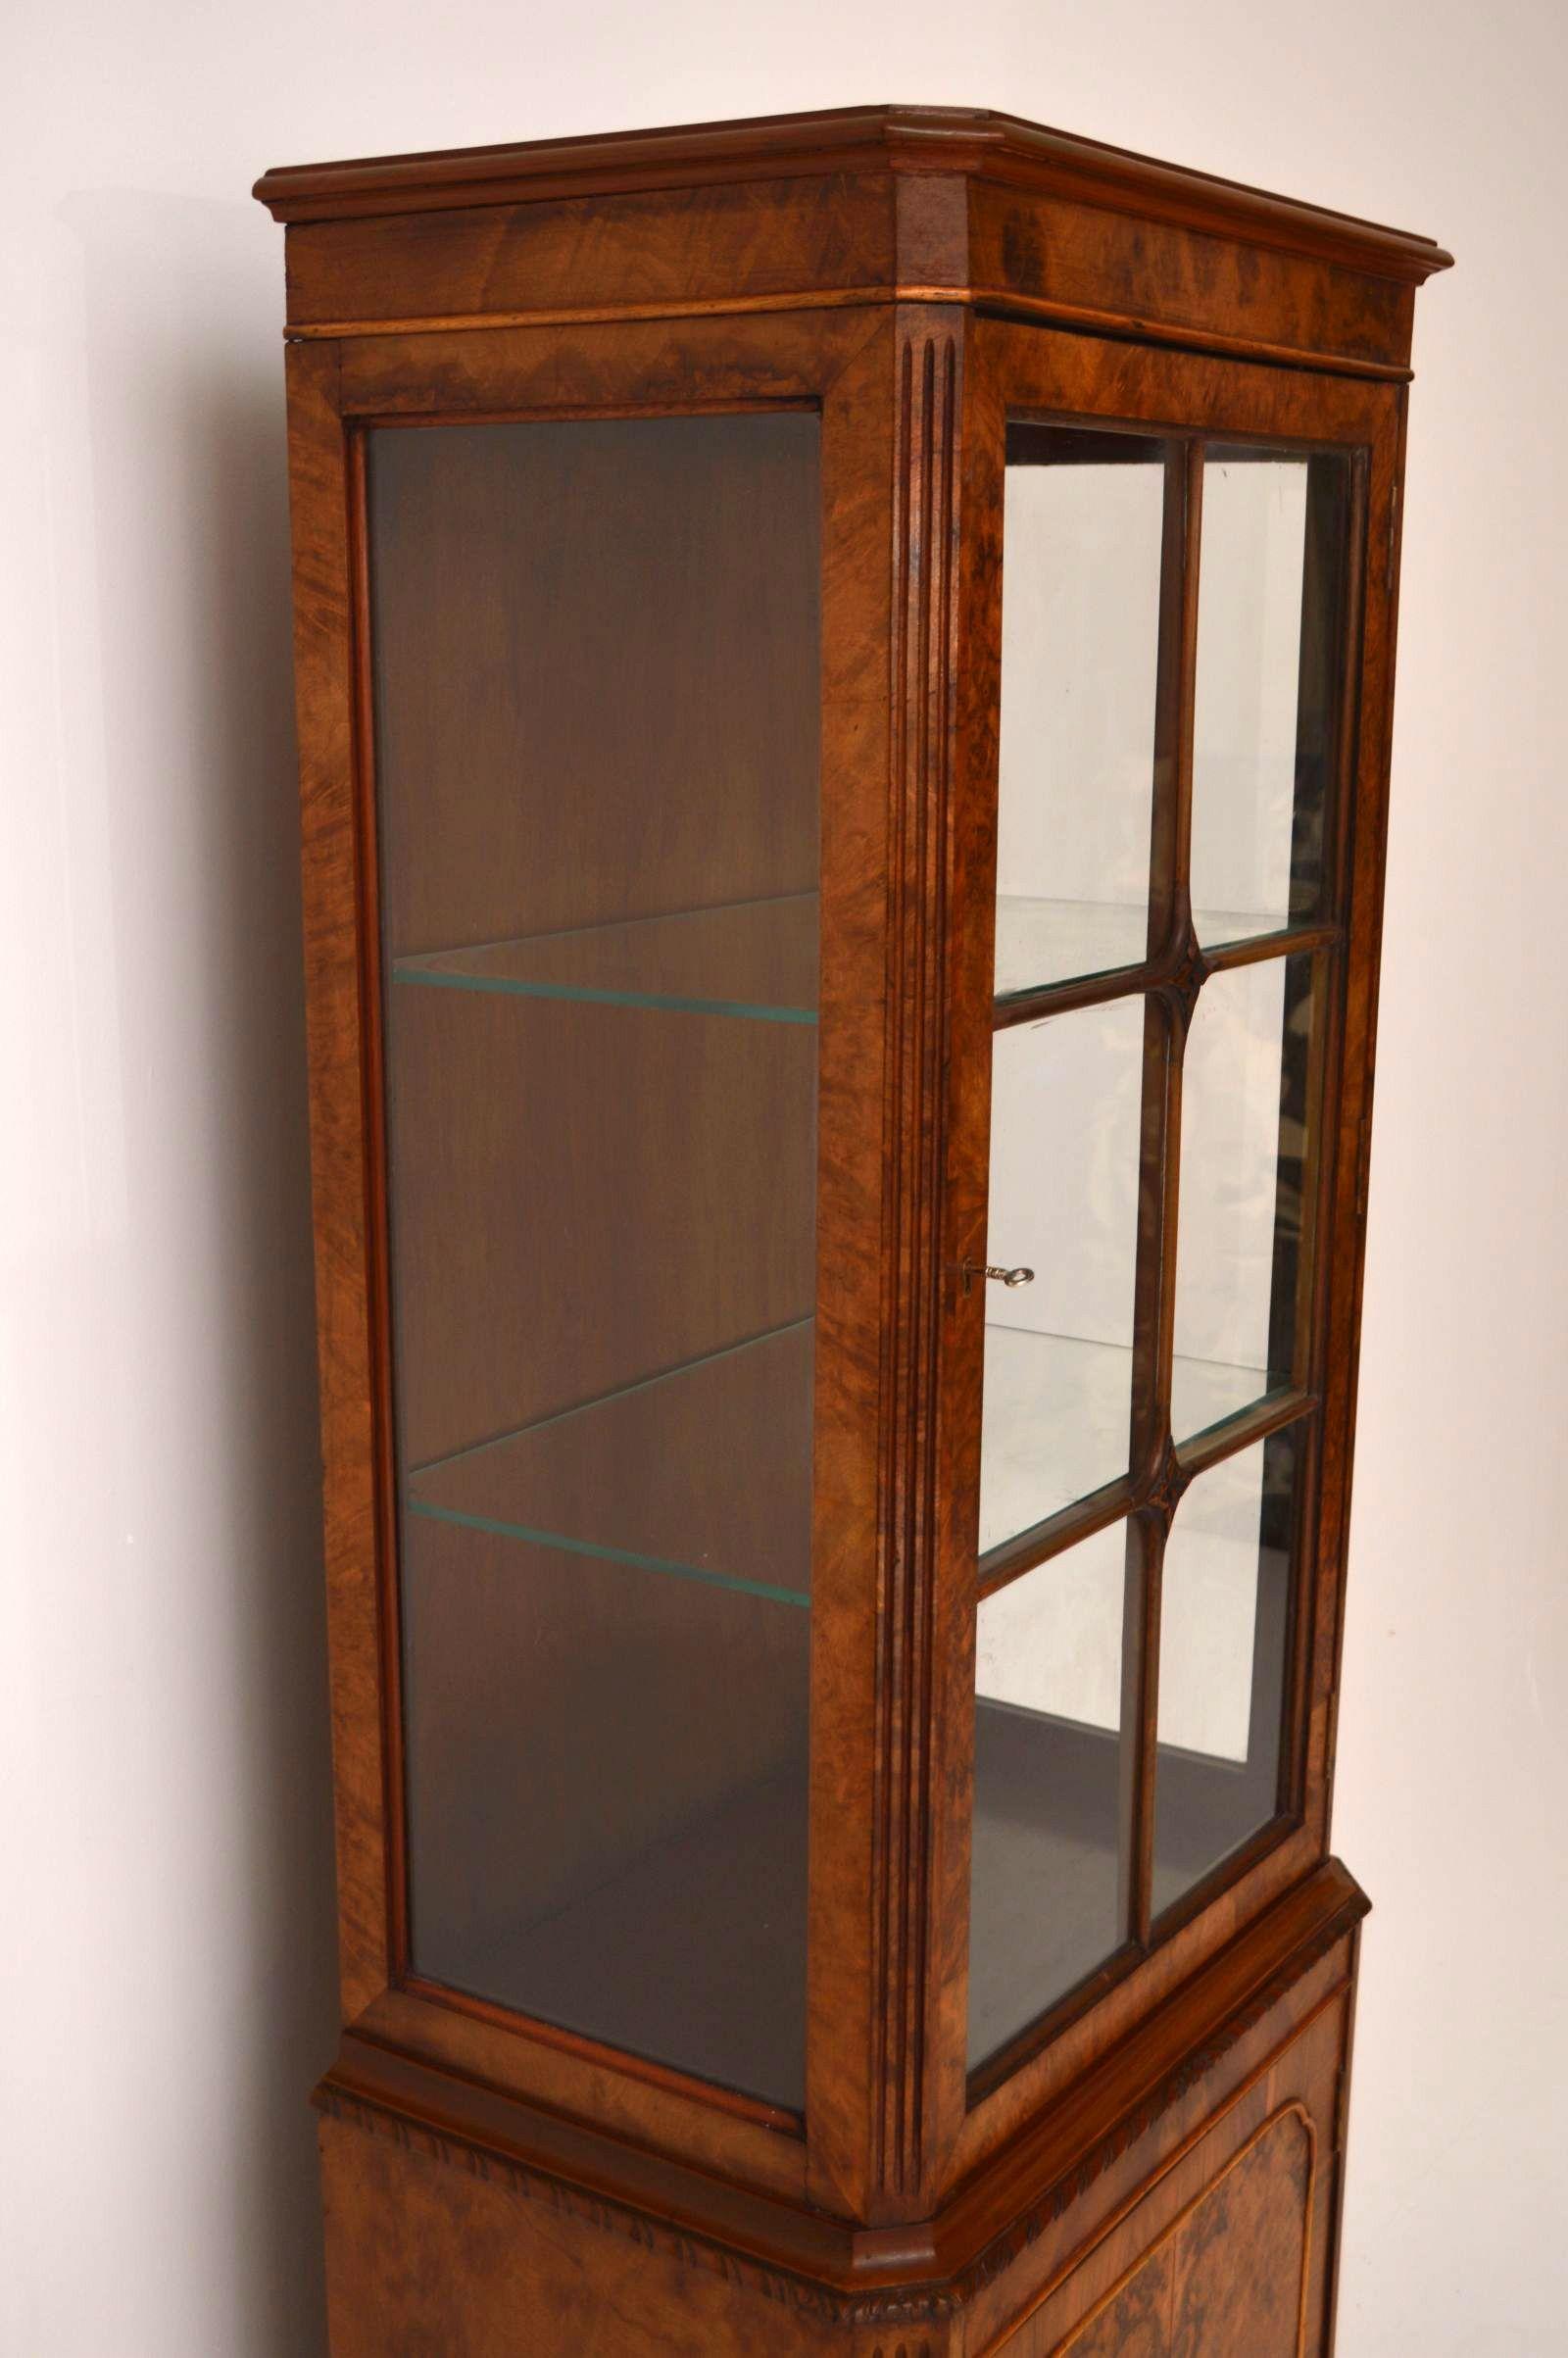 schmale antike nussbaum vitrine. Black Bedroom Furniture Sets. Home Design Ideas